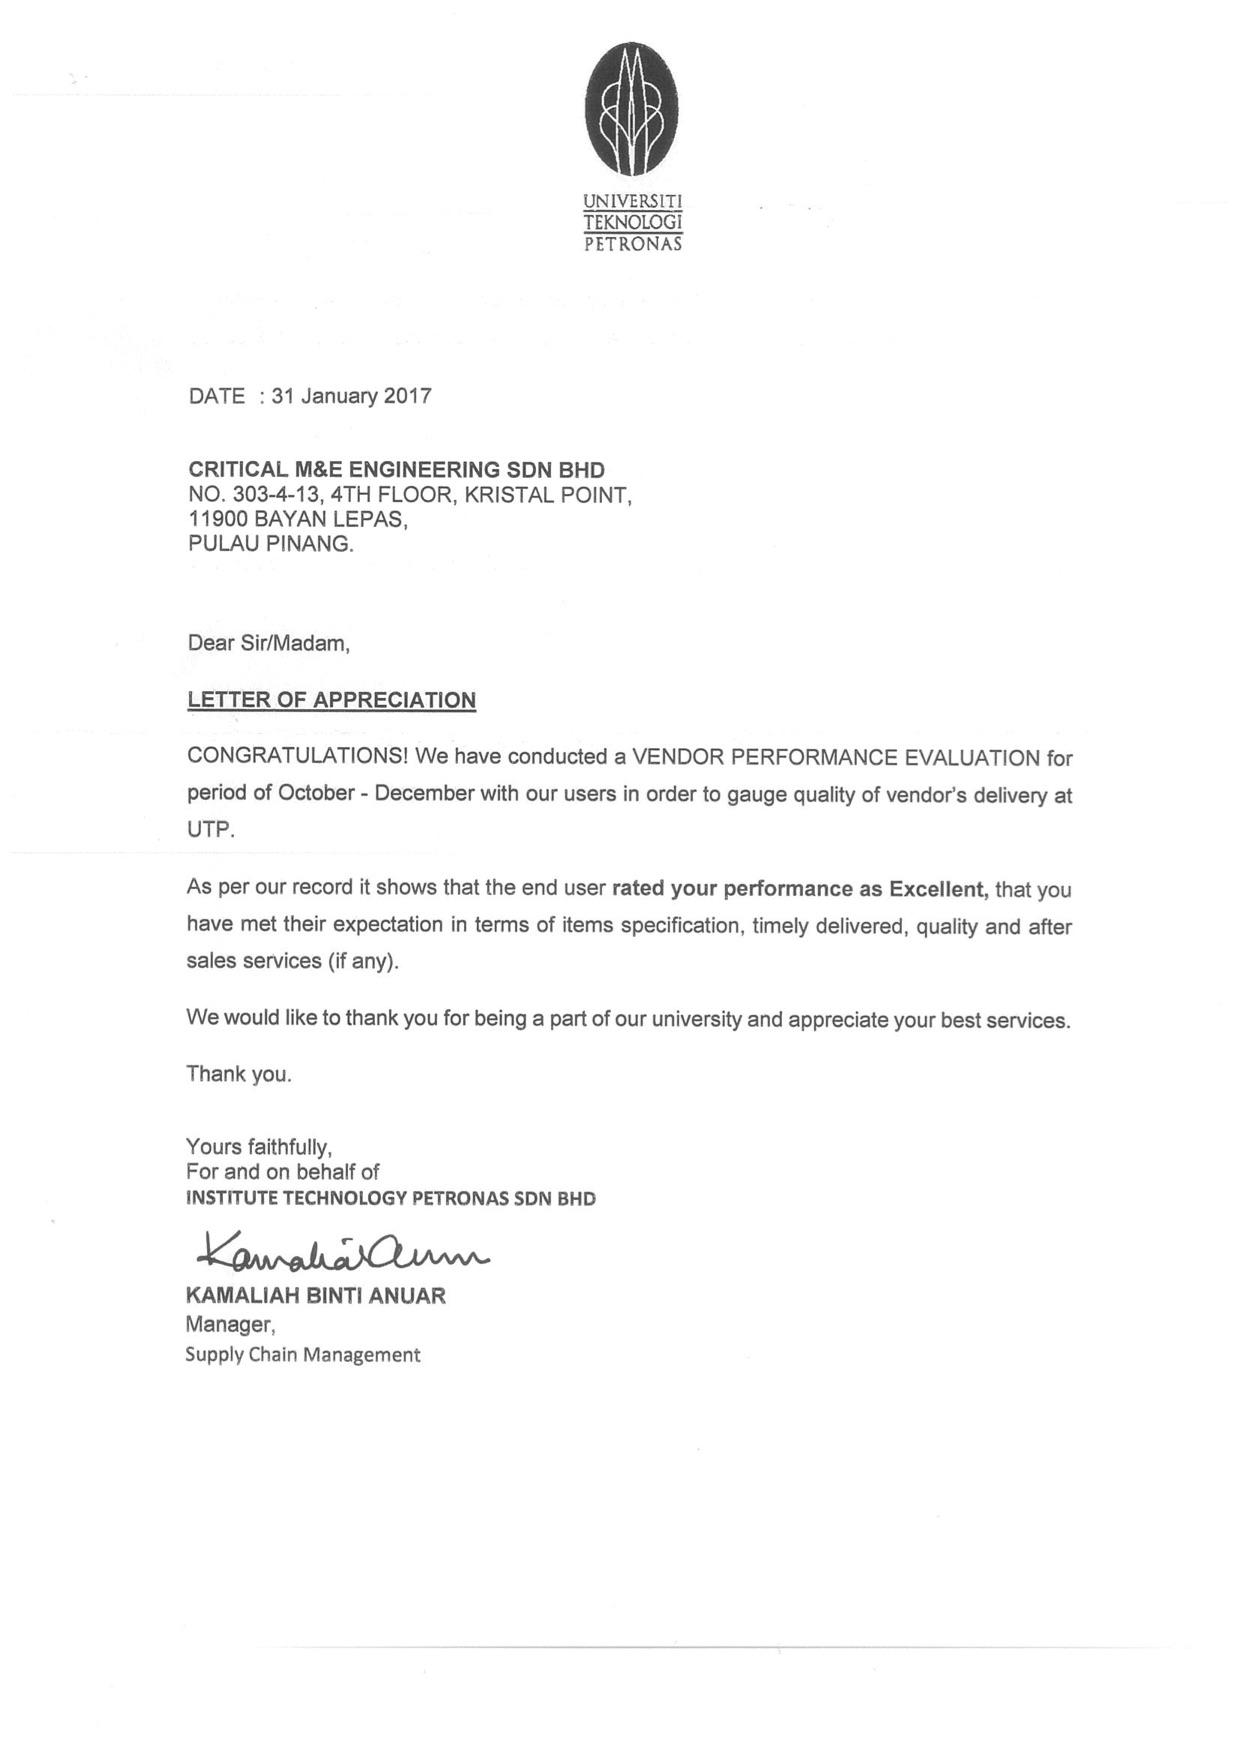 Letter Of Appreciation University Technology Petronas